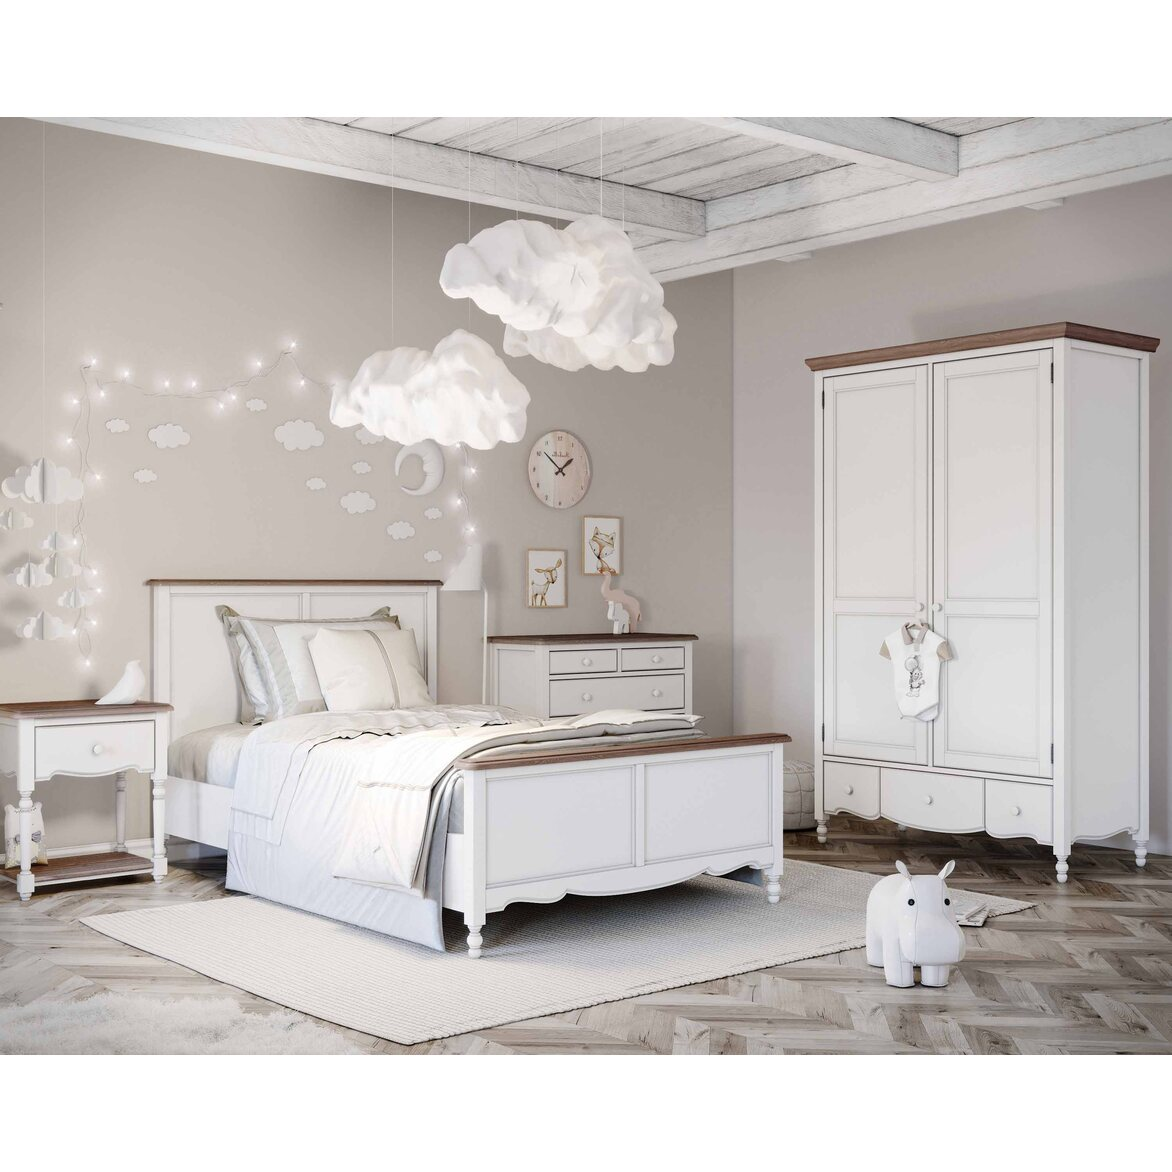 Шкаф двухстворчатый Leblanc, белый 7 | Платяные шкафы Kingsby